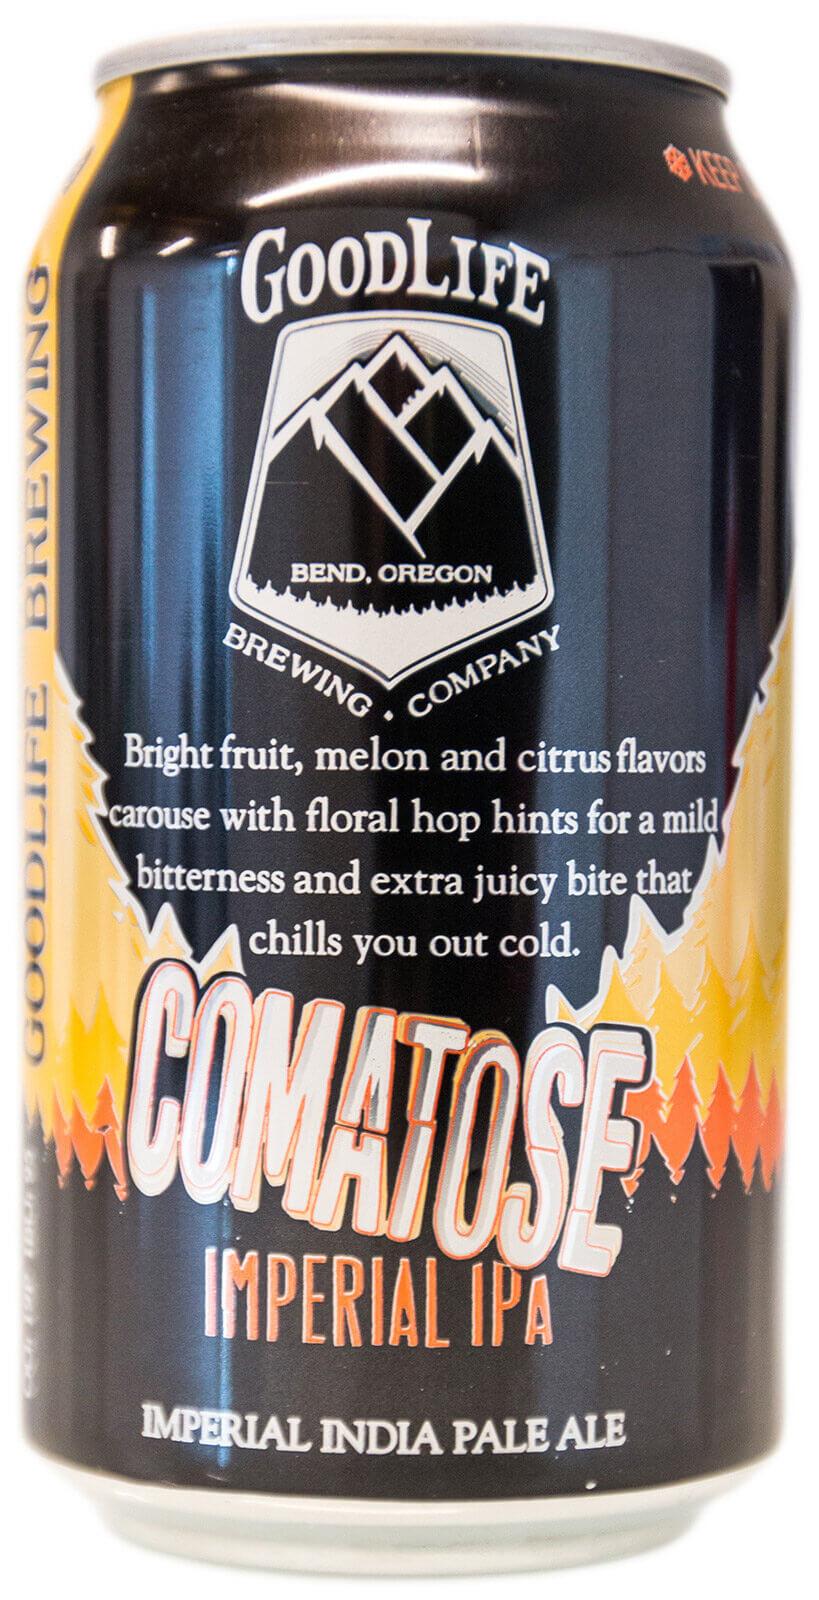 Crowerks designed the Comatose Imperial IPA artwork